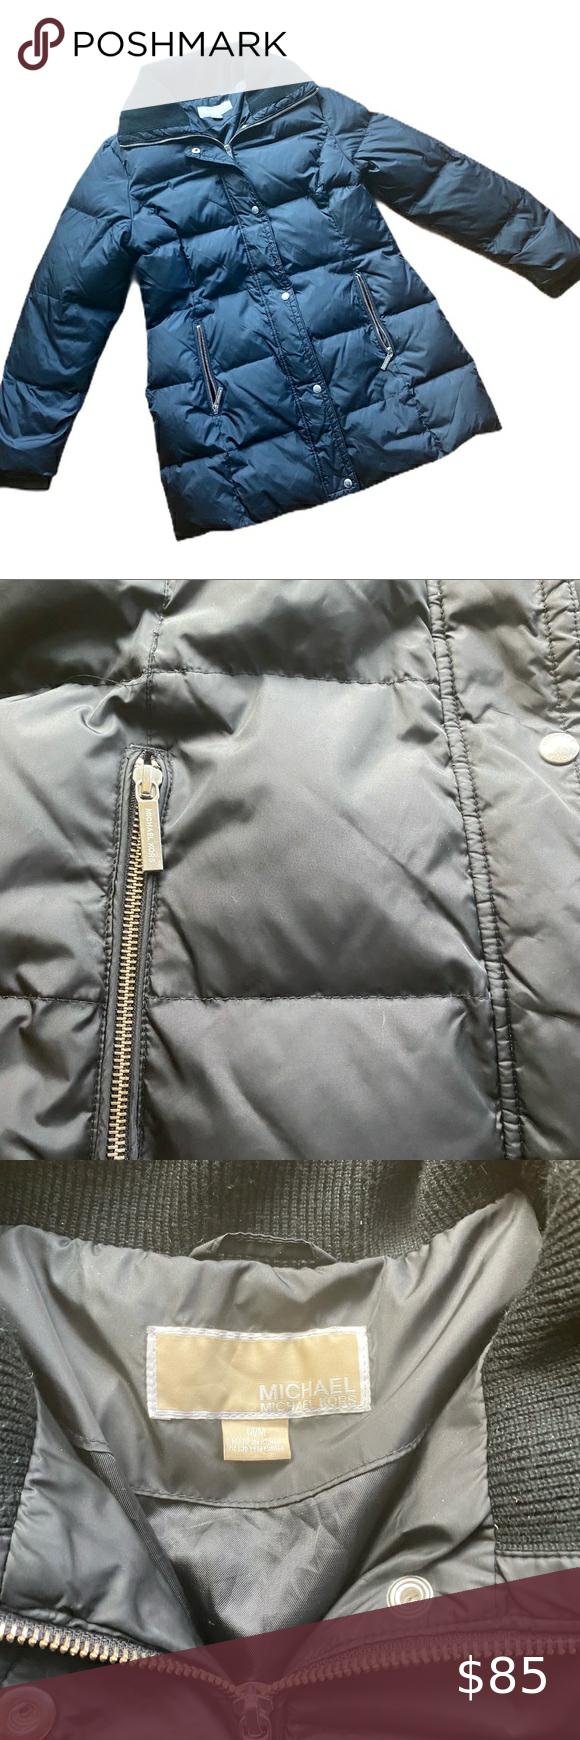 Michael Michael Kors Black Puffer Jacket Black Puffer Jacket Black Puffer Michael Kors Black [ 1740 x 580 Pixel ]